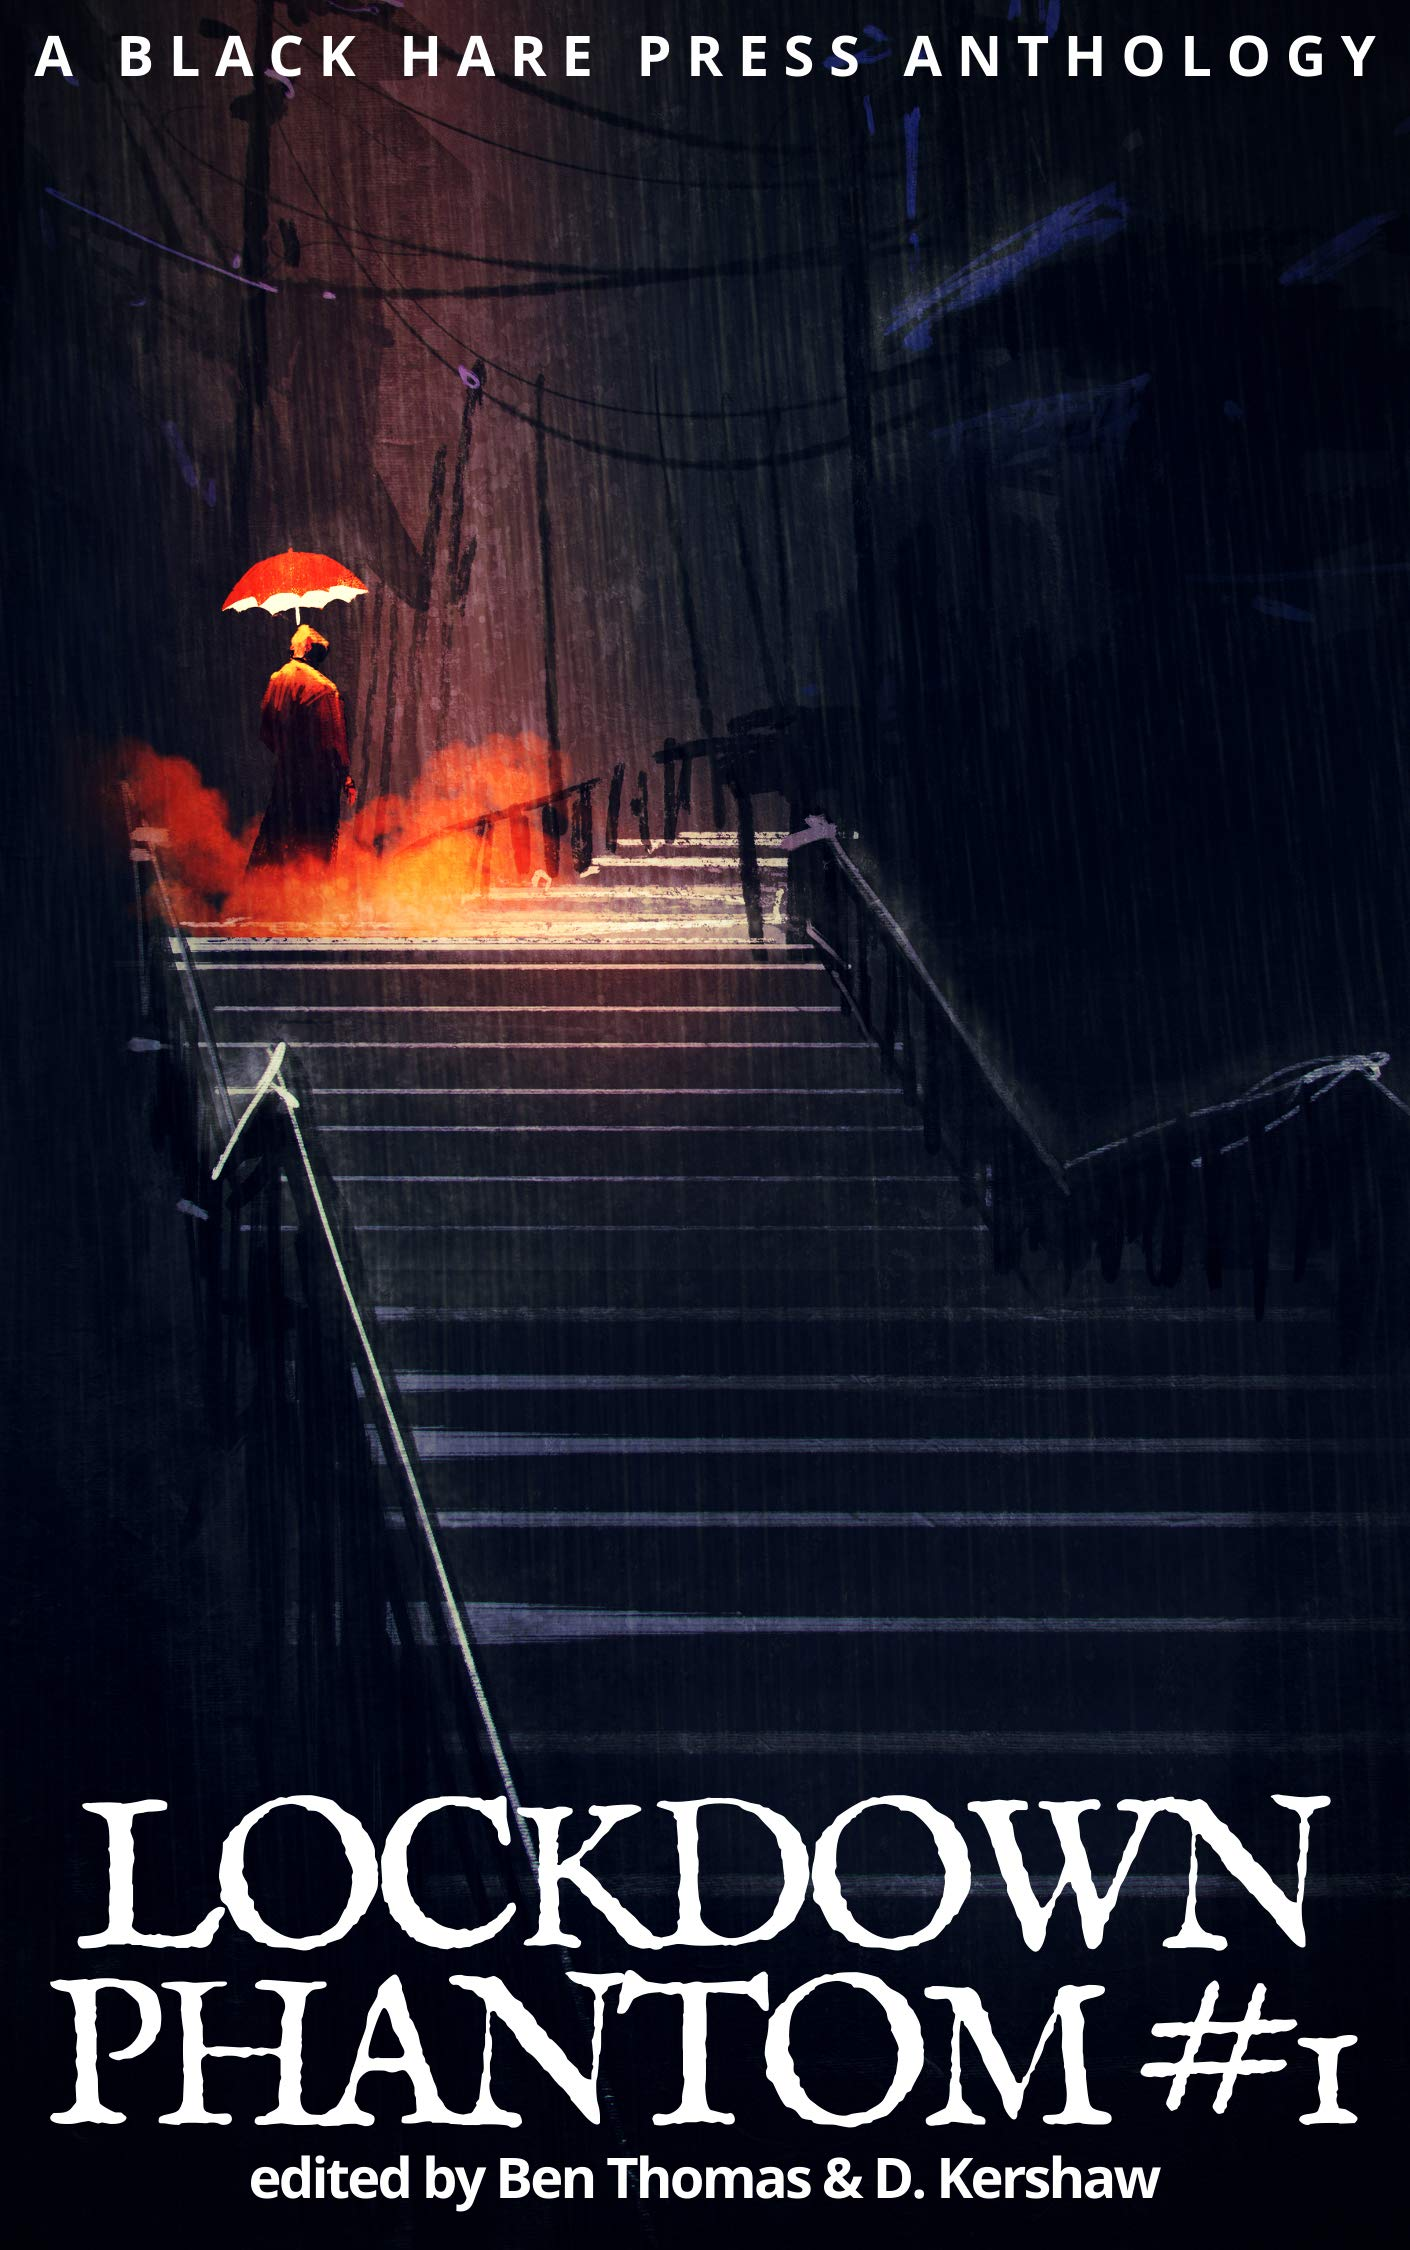 Lockdown Phantom #1